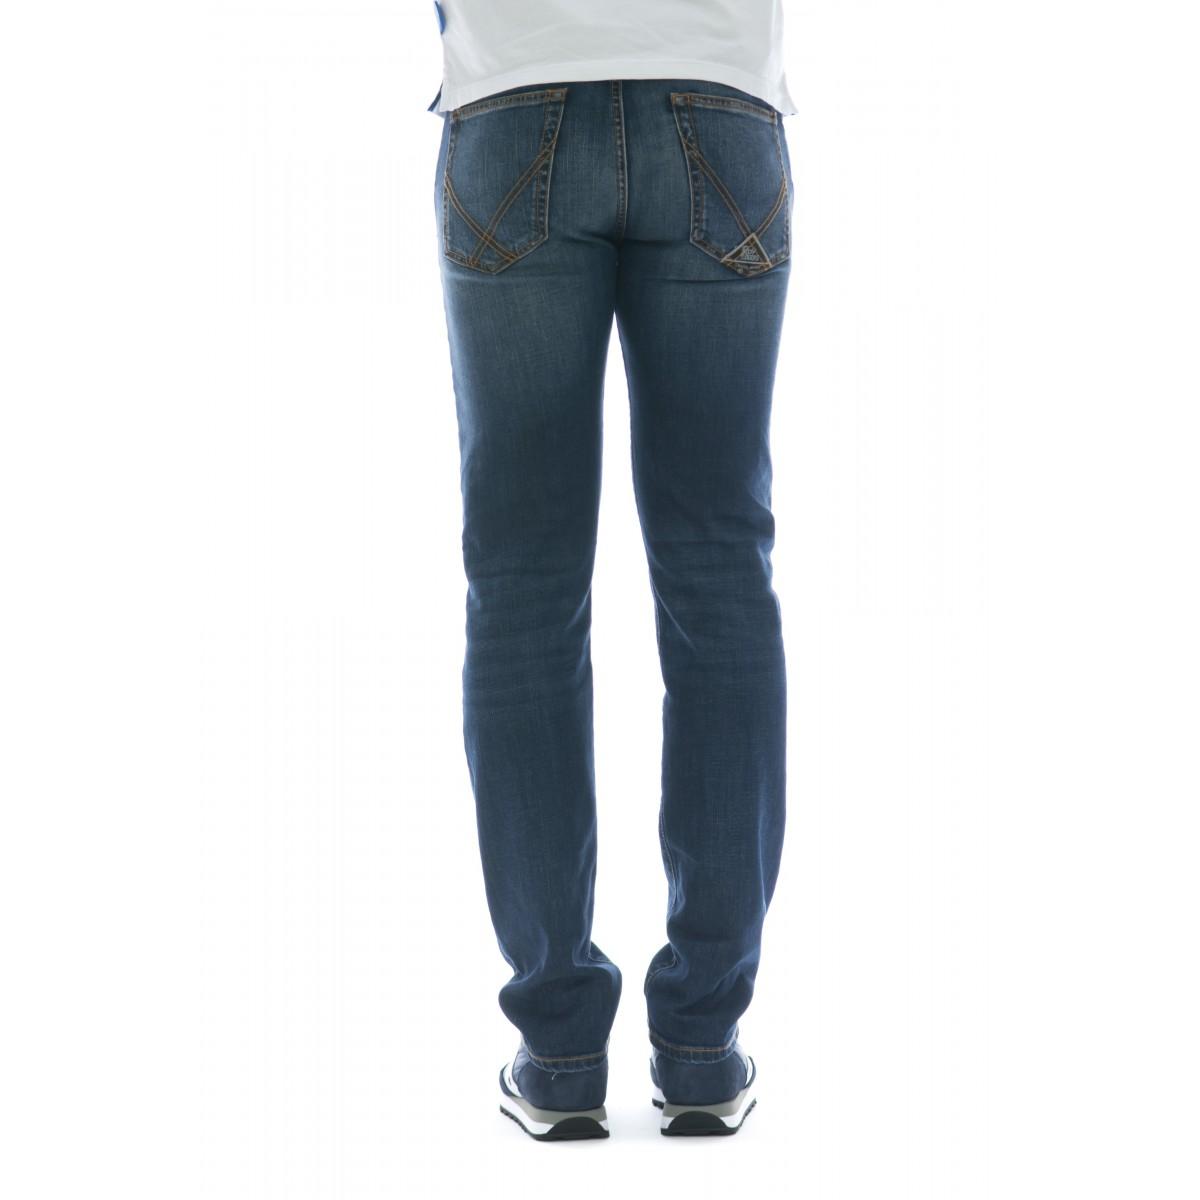 Jeans - 529 carlin